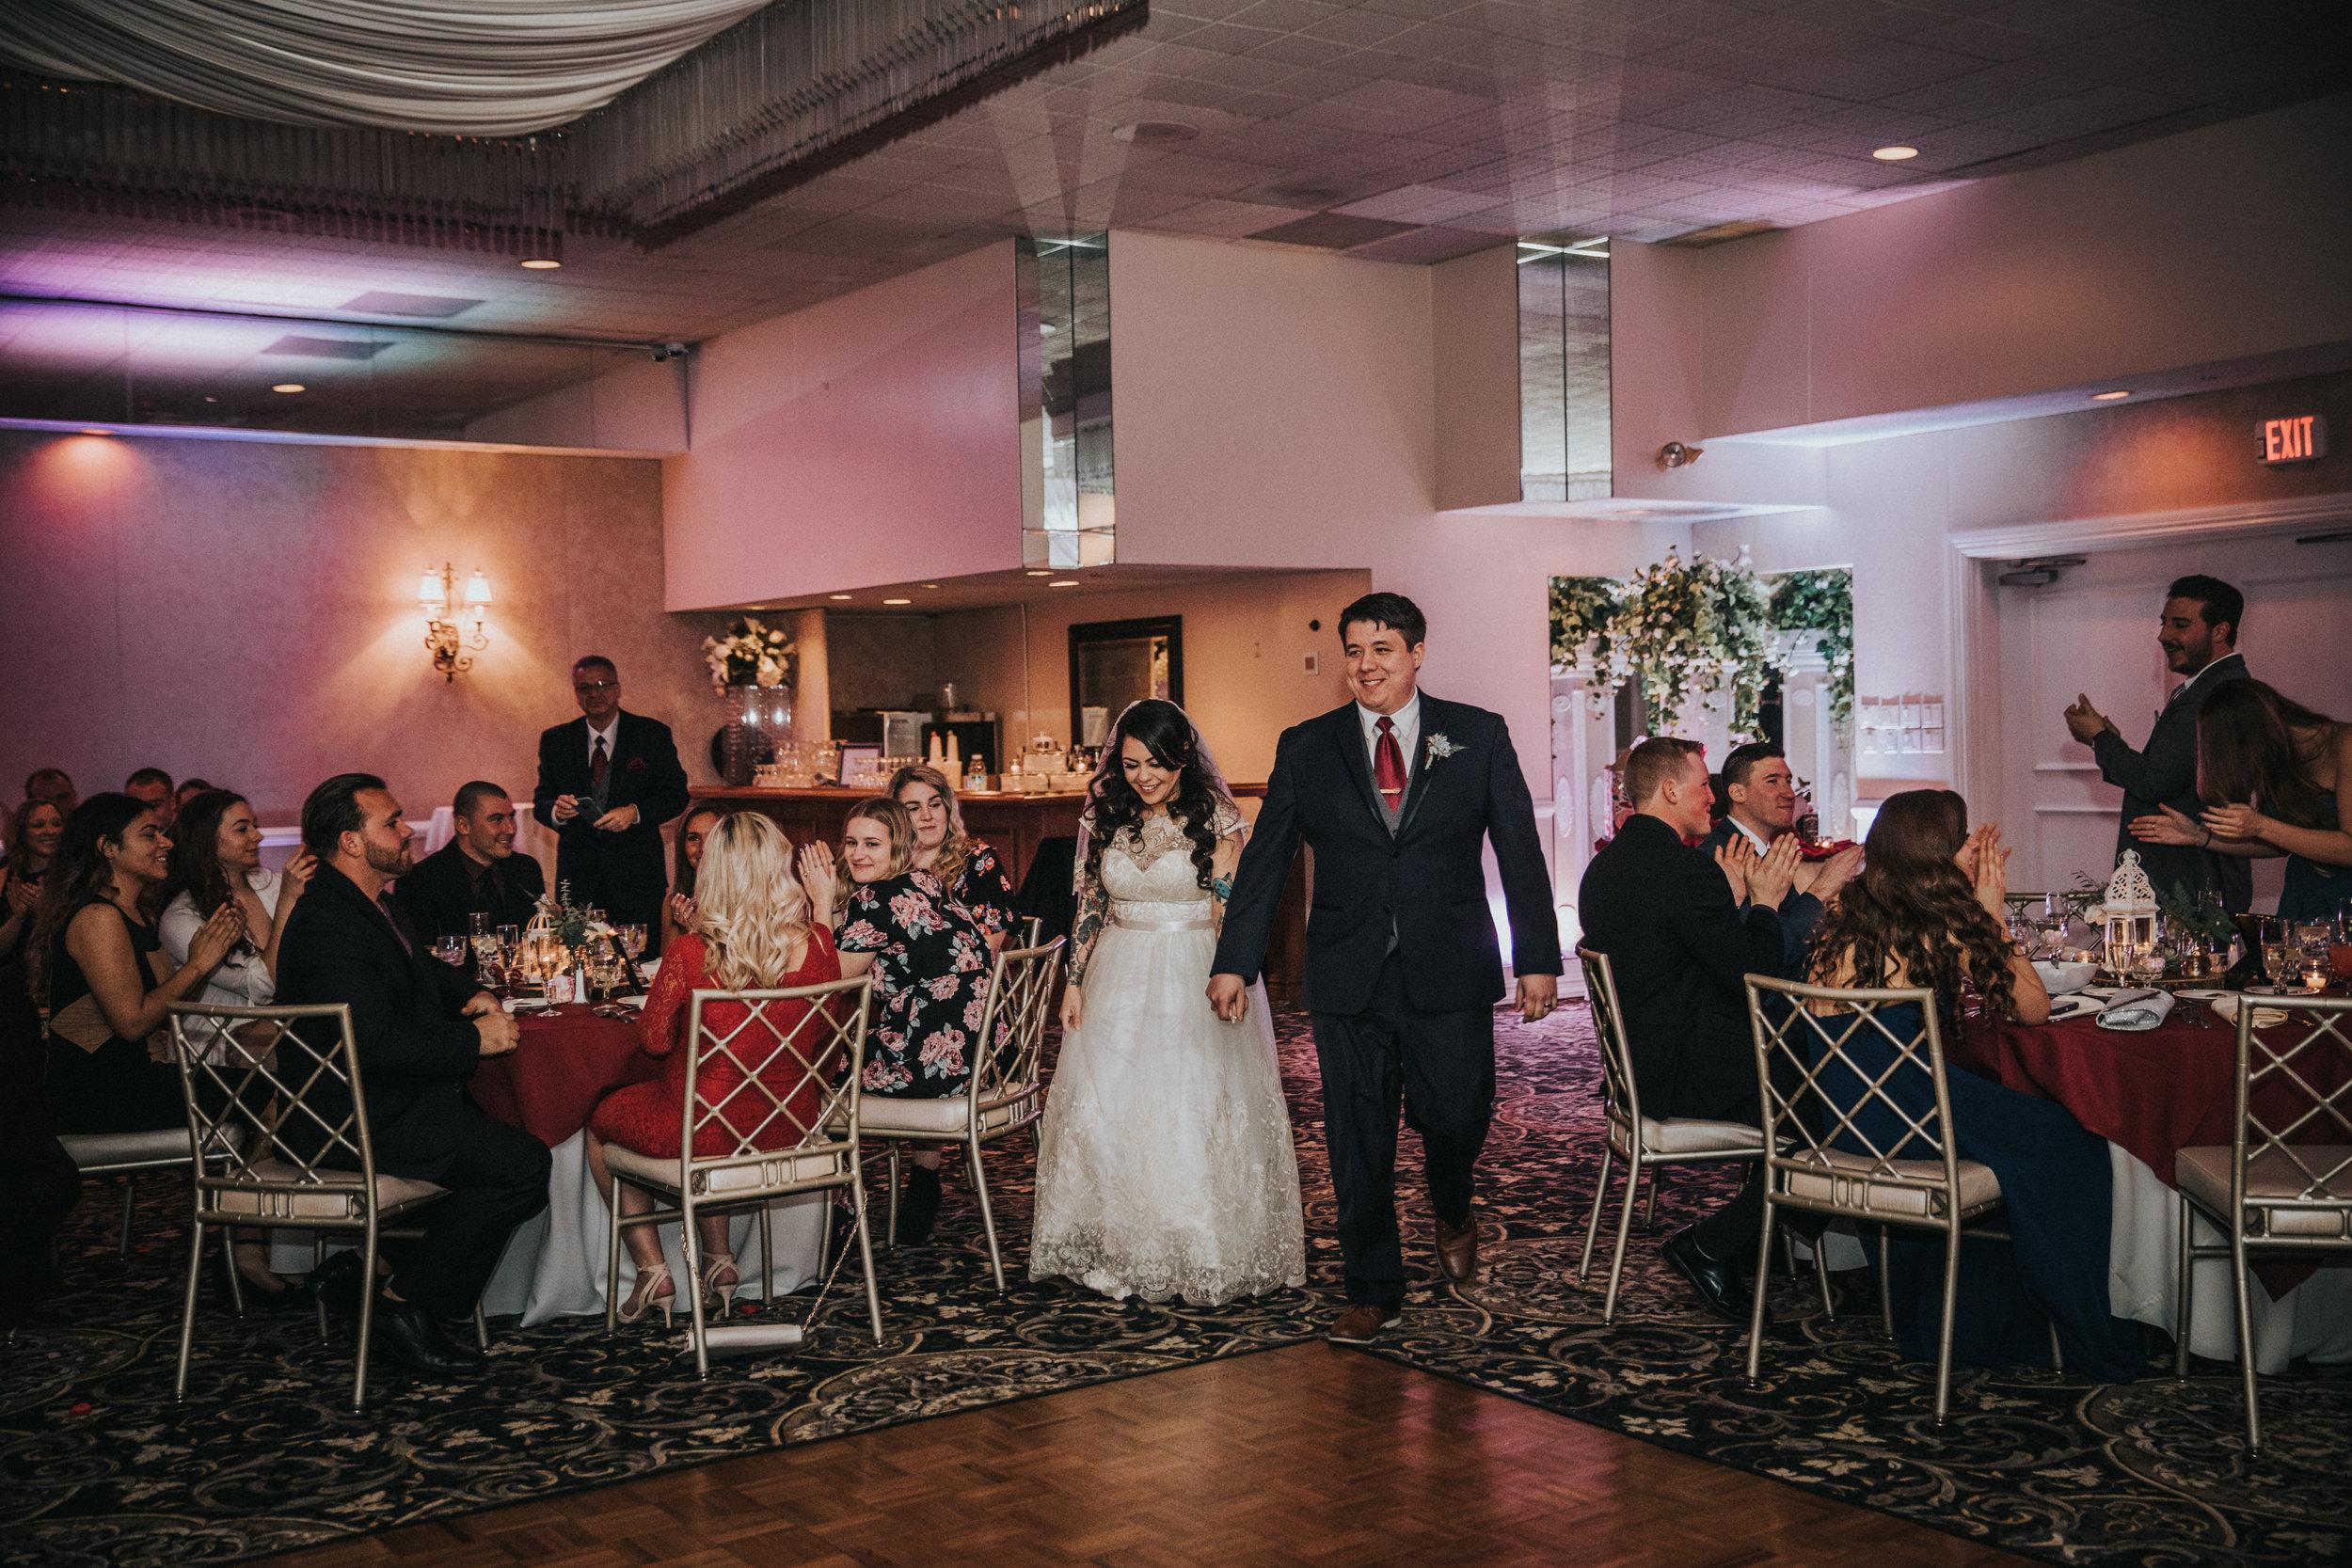 New-Jersey-Wedding-Photographer-ReceptionCenter-Valeria&Mike-Reception (65 of 265).jpg